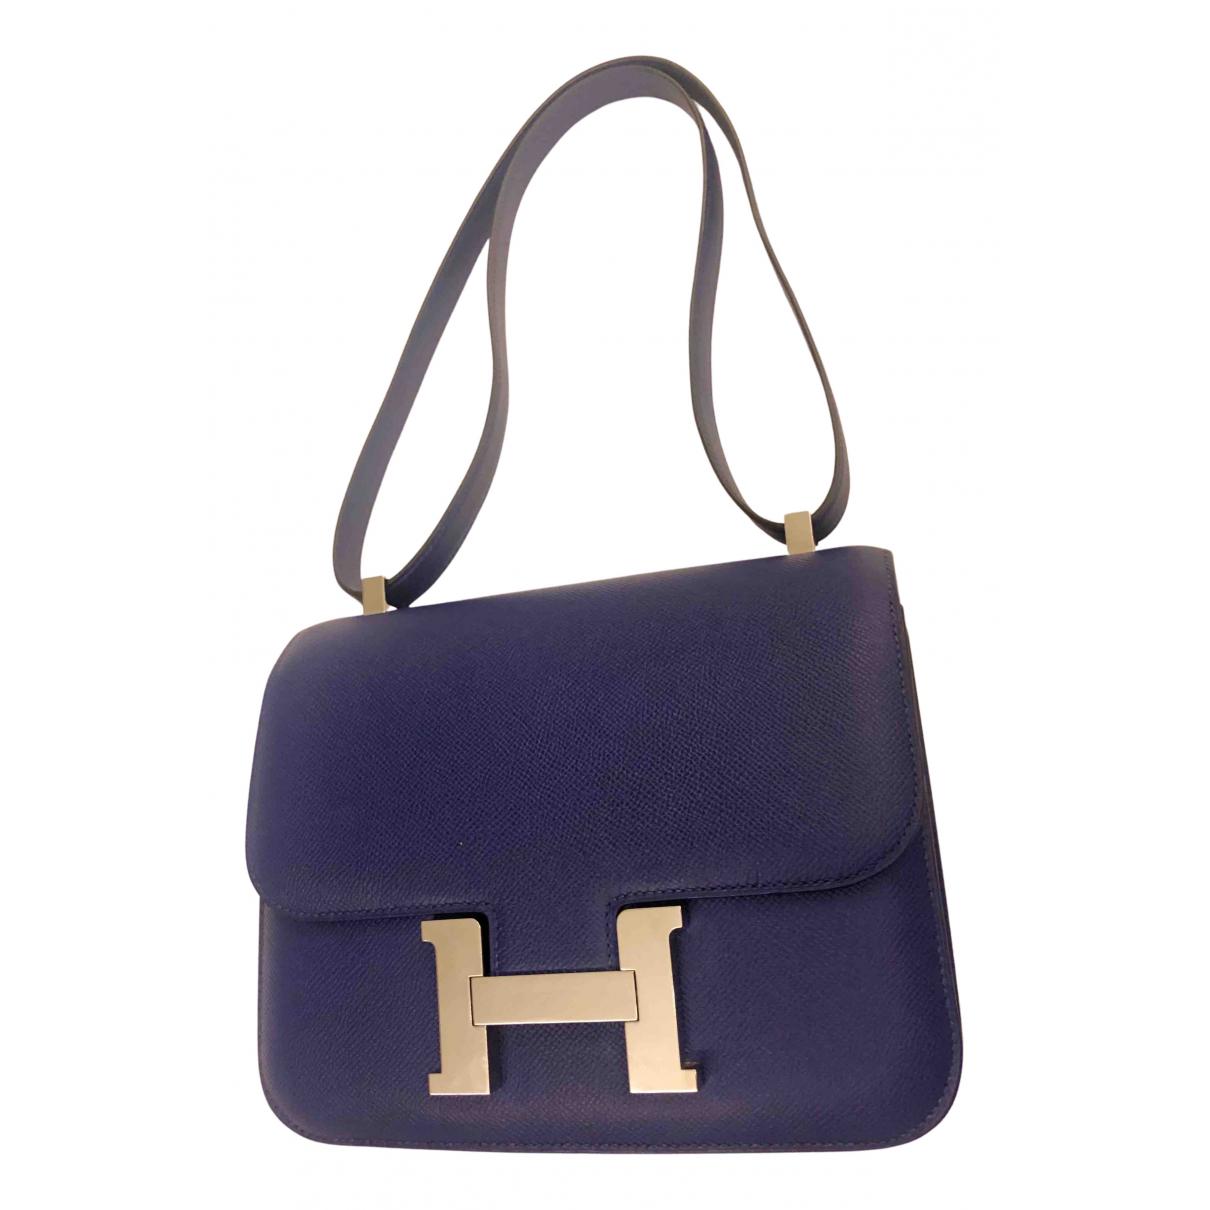 Hermès Constance Blue Leather handbag for Women N